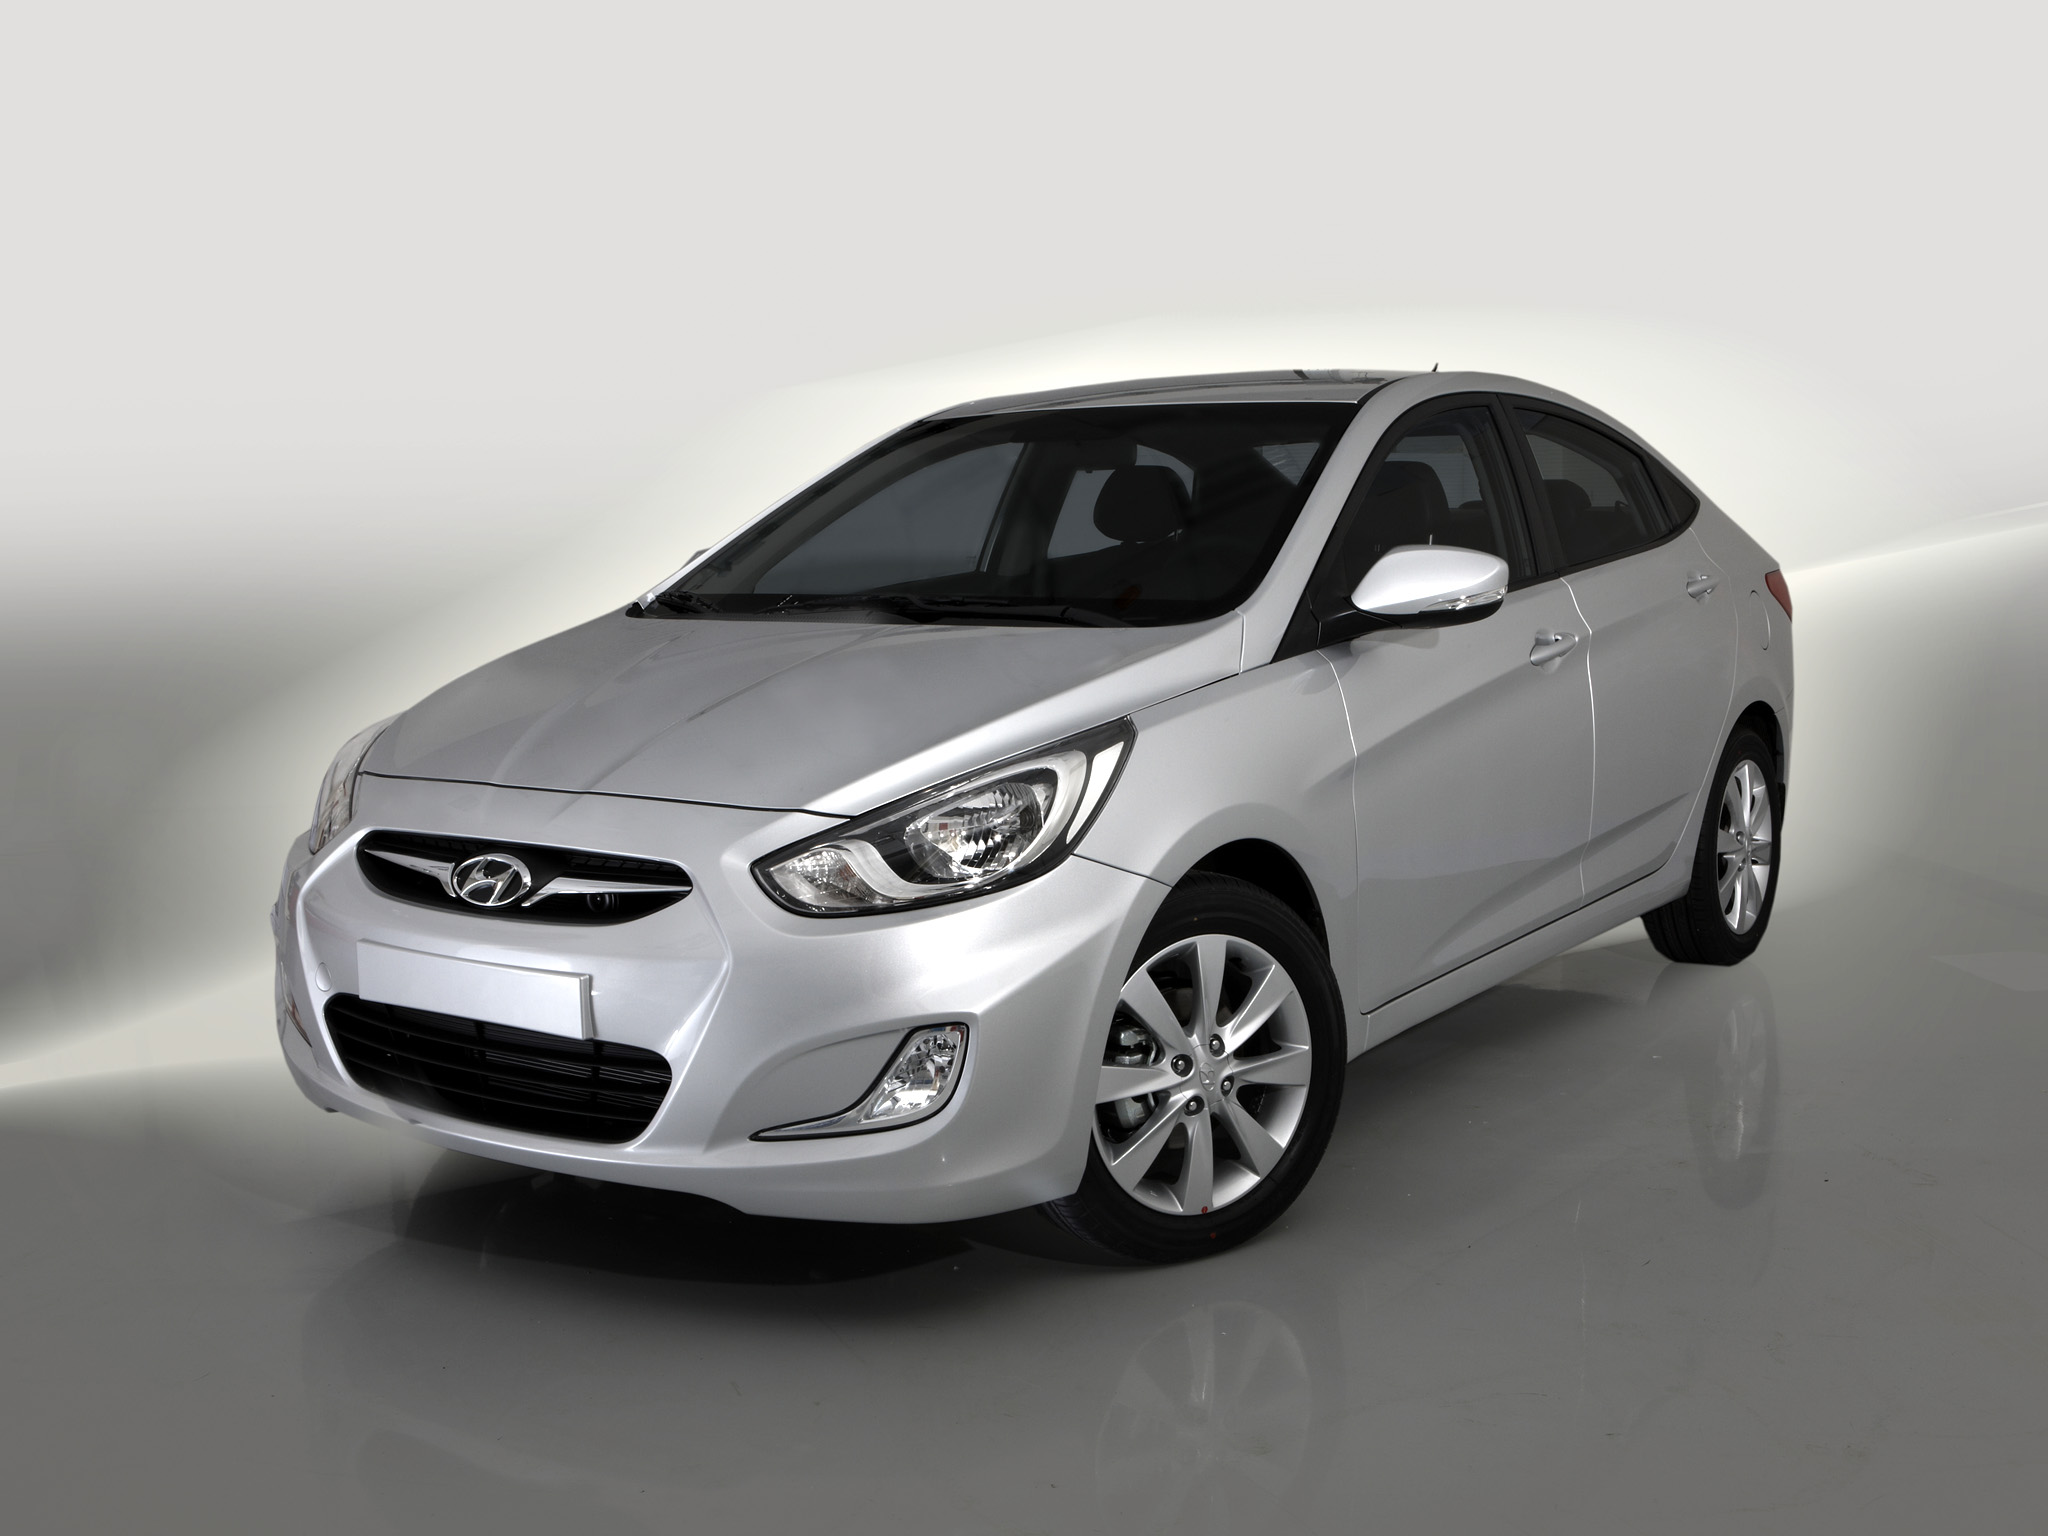 2012 - [Lada] Kalina II - Page 4 Hyundai_solaris_1st_sedan4d-875